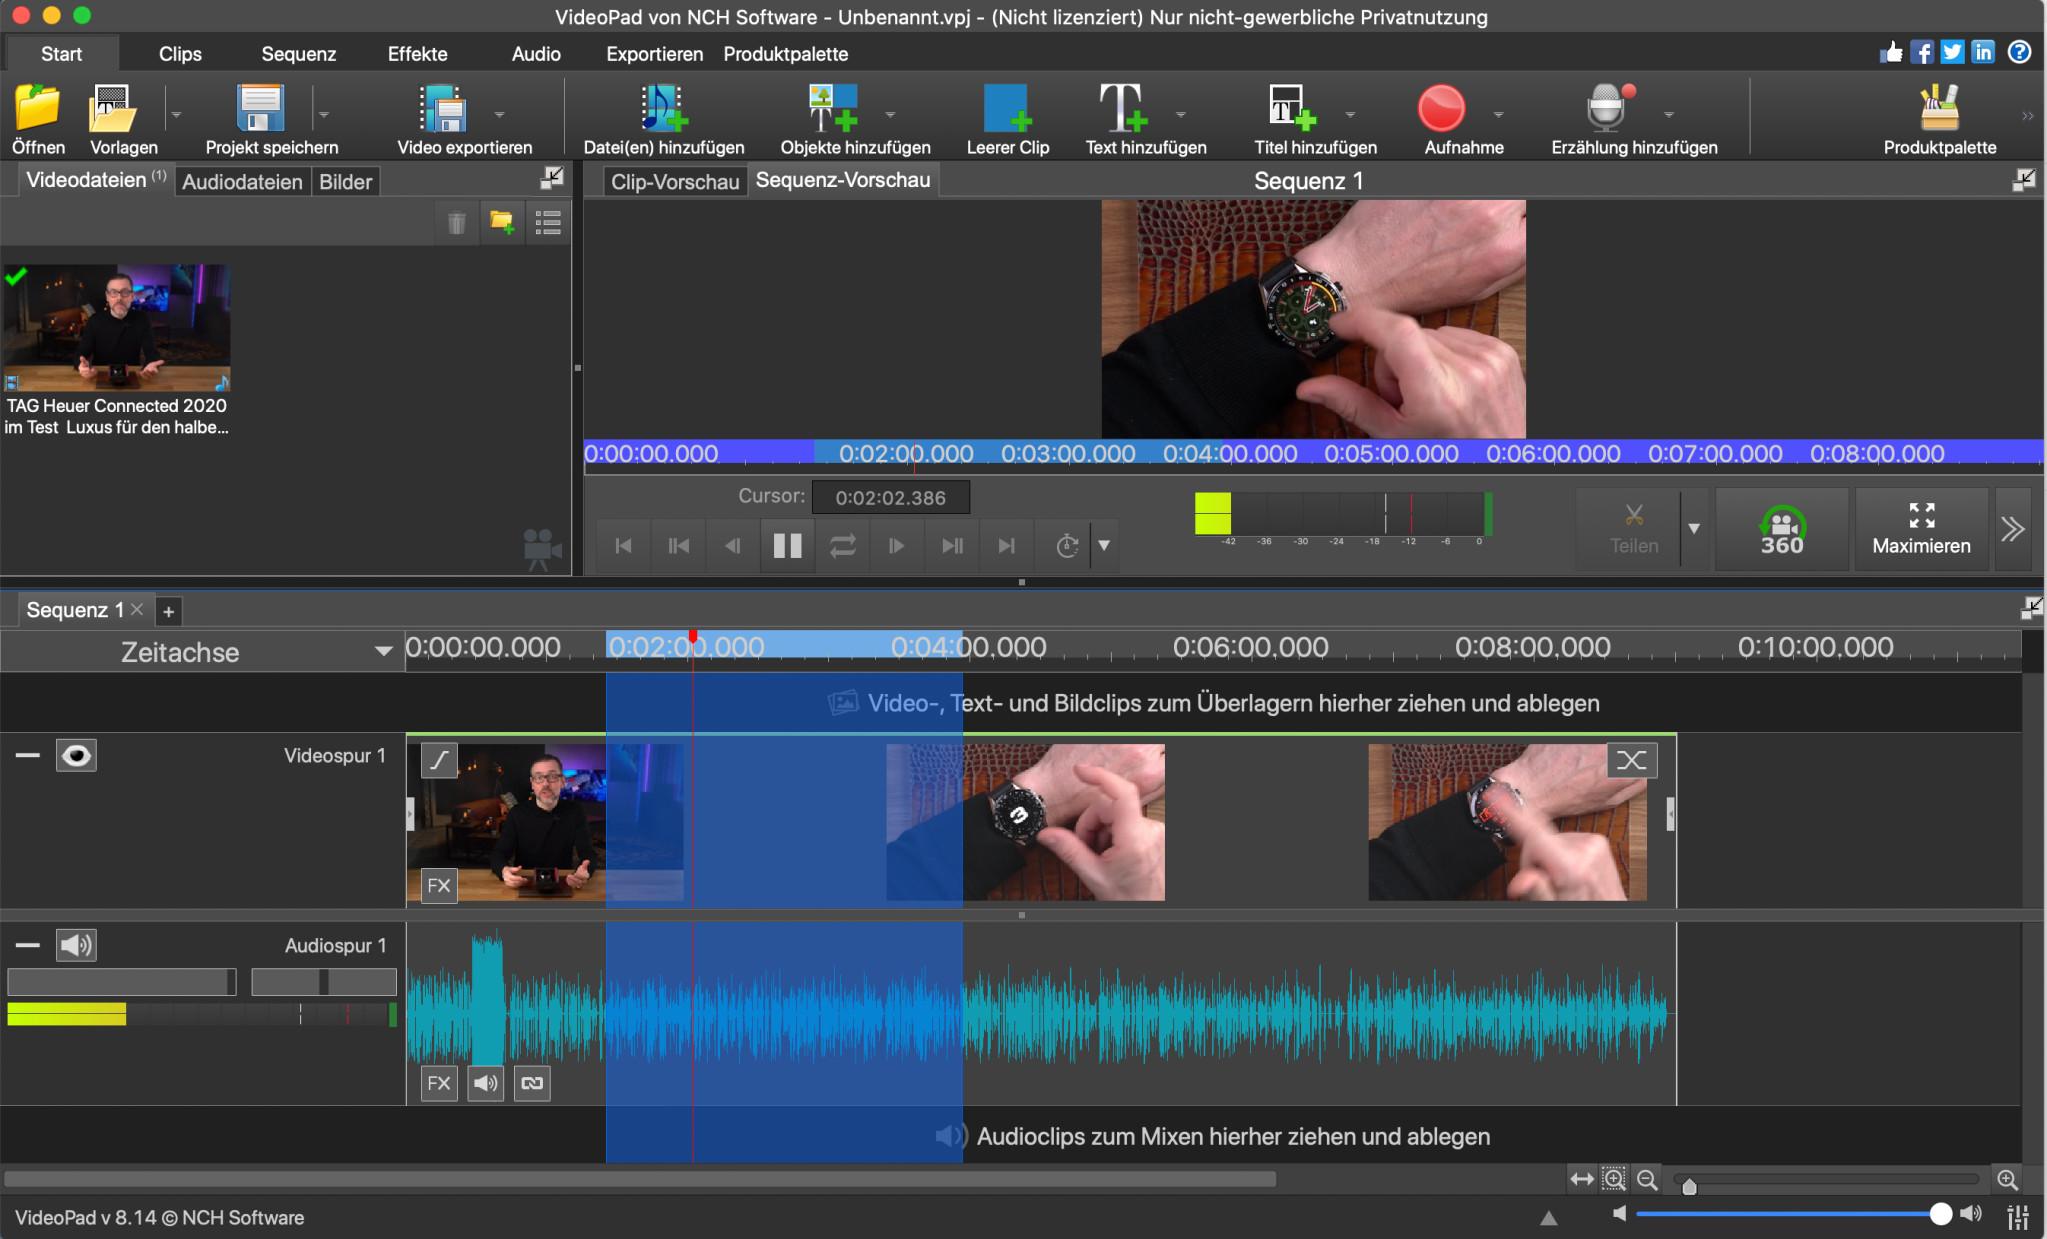 Screenshot 1 - VideoPad Video-Editor (Mac)